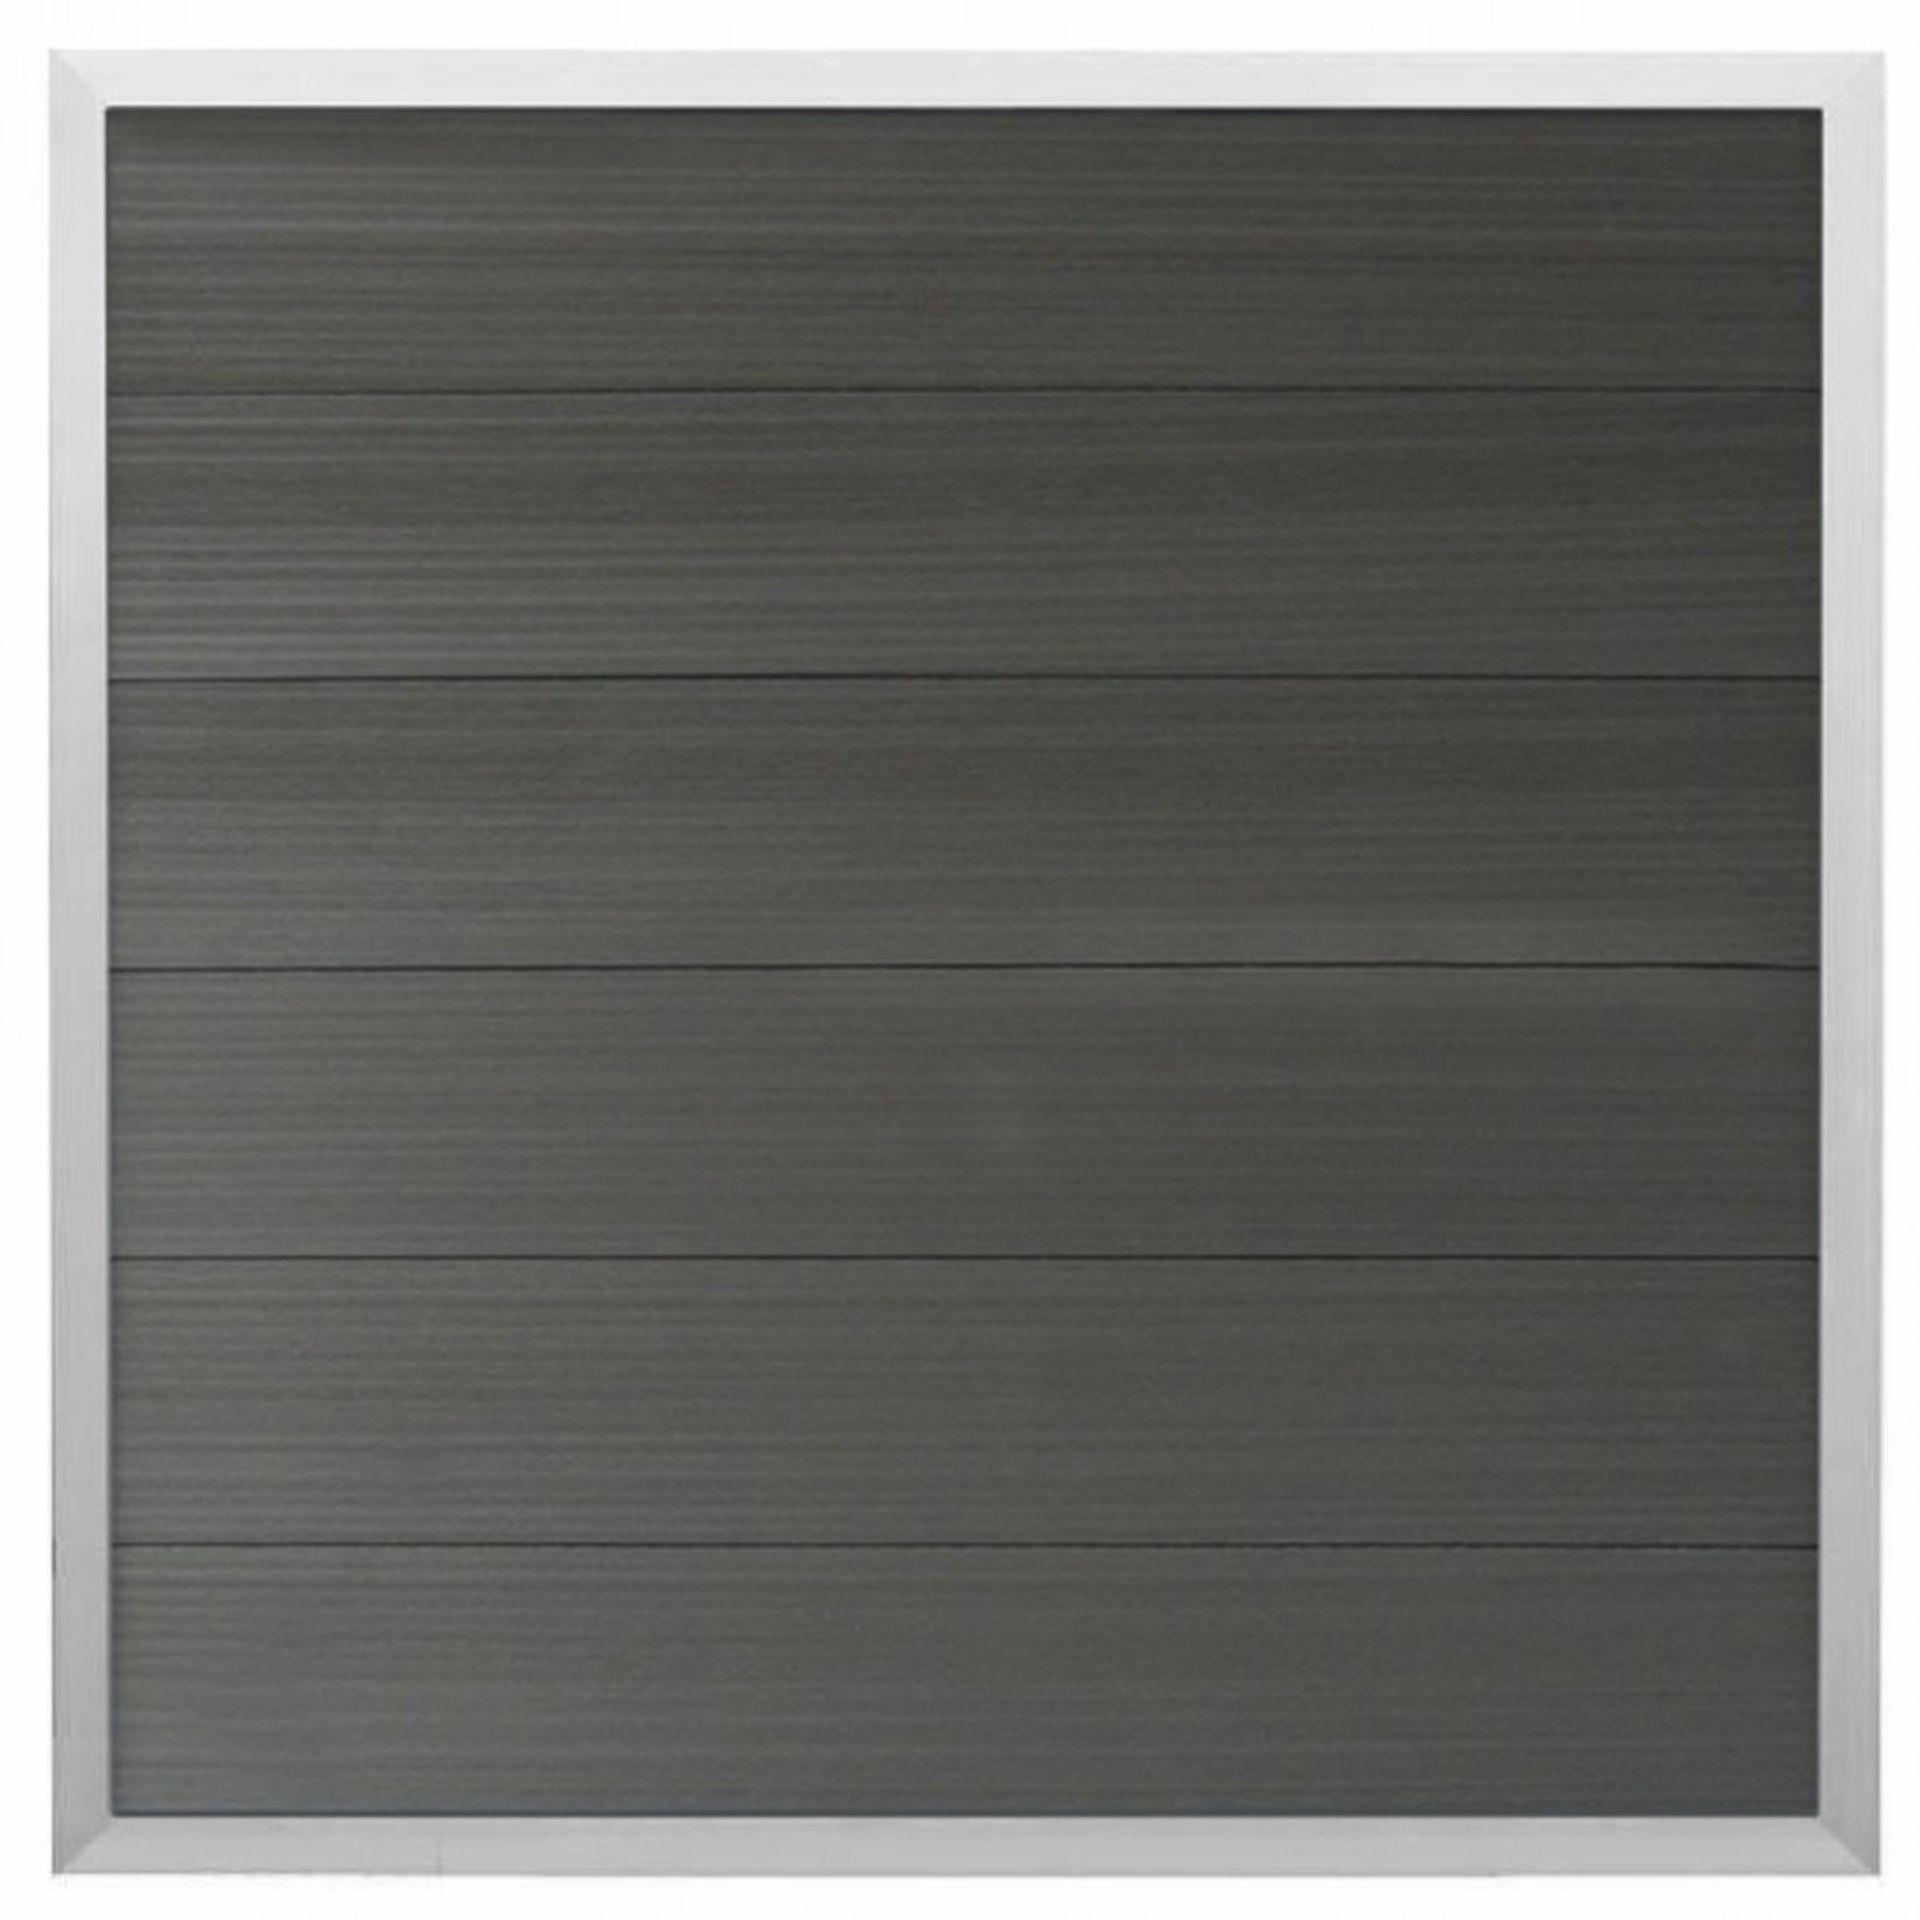 WPC Zaun Fehmarn (Forte) 180x180 cm, anthrazit/silber